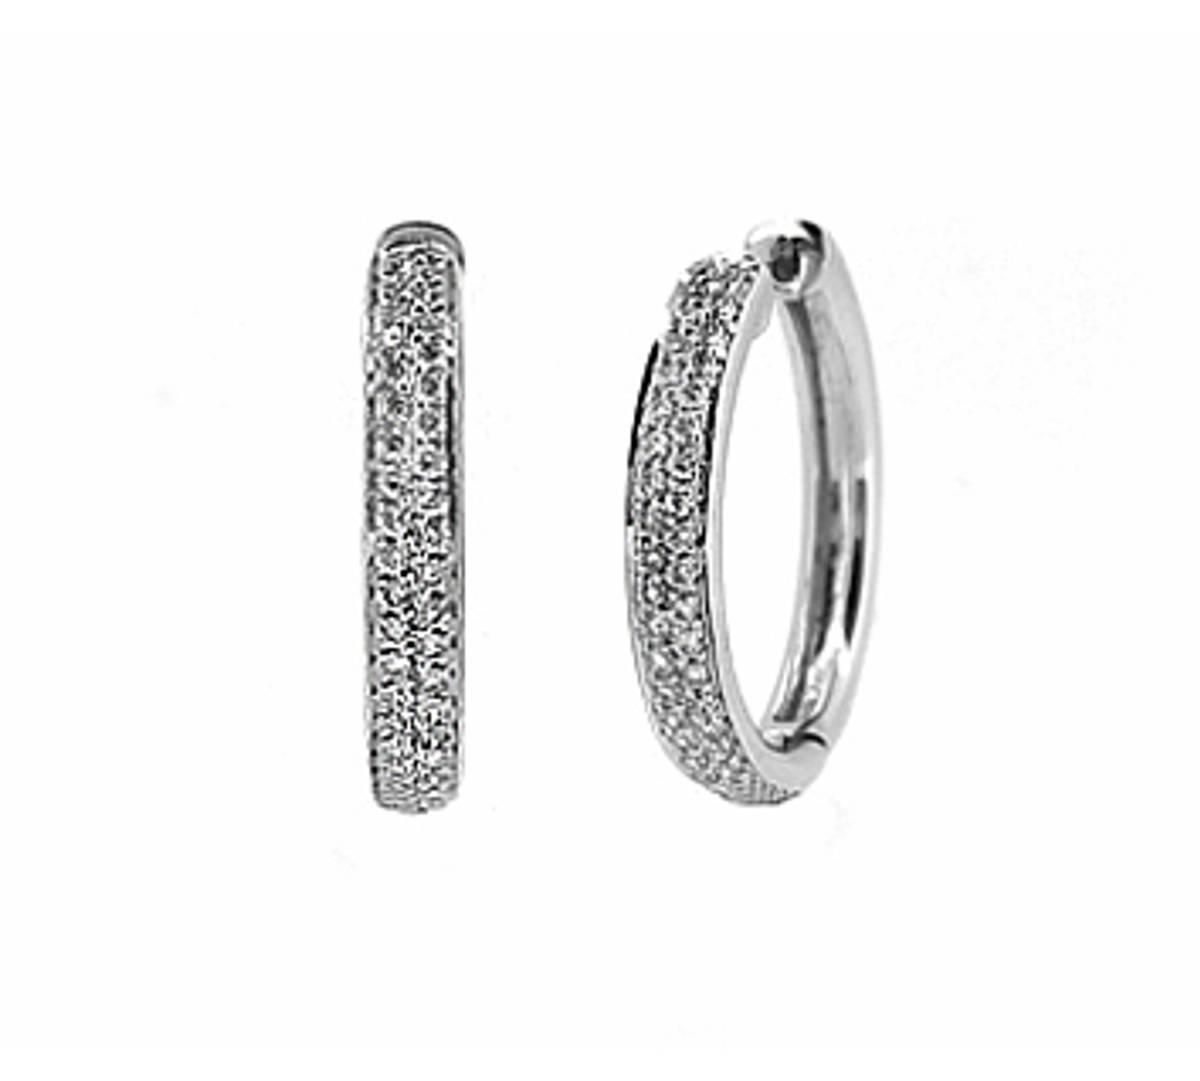 18k white gold brilliant cut diamond hoop earringsDETAILSCarat: total diamond weight 0.31ctsCut: Brilliant cutMetal: 18k white gold Made in Ireland